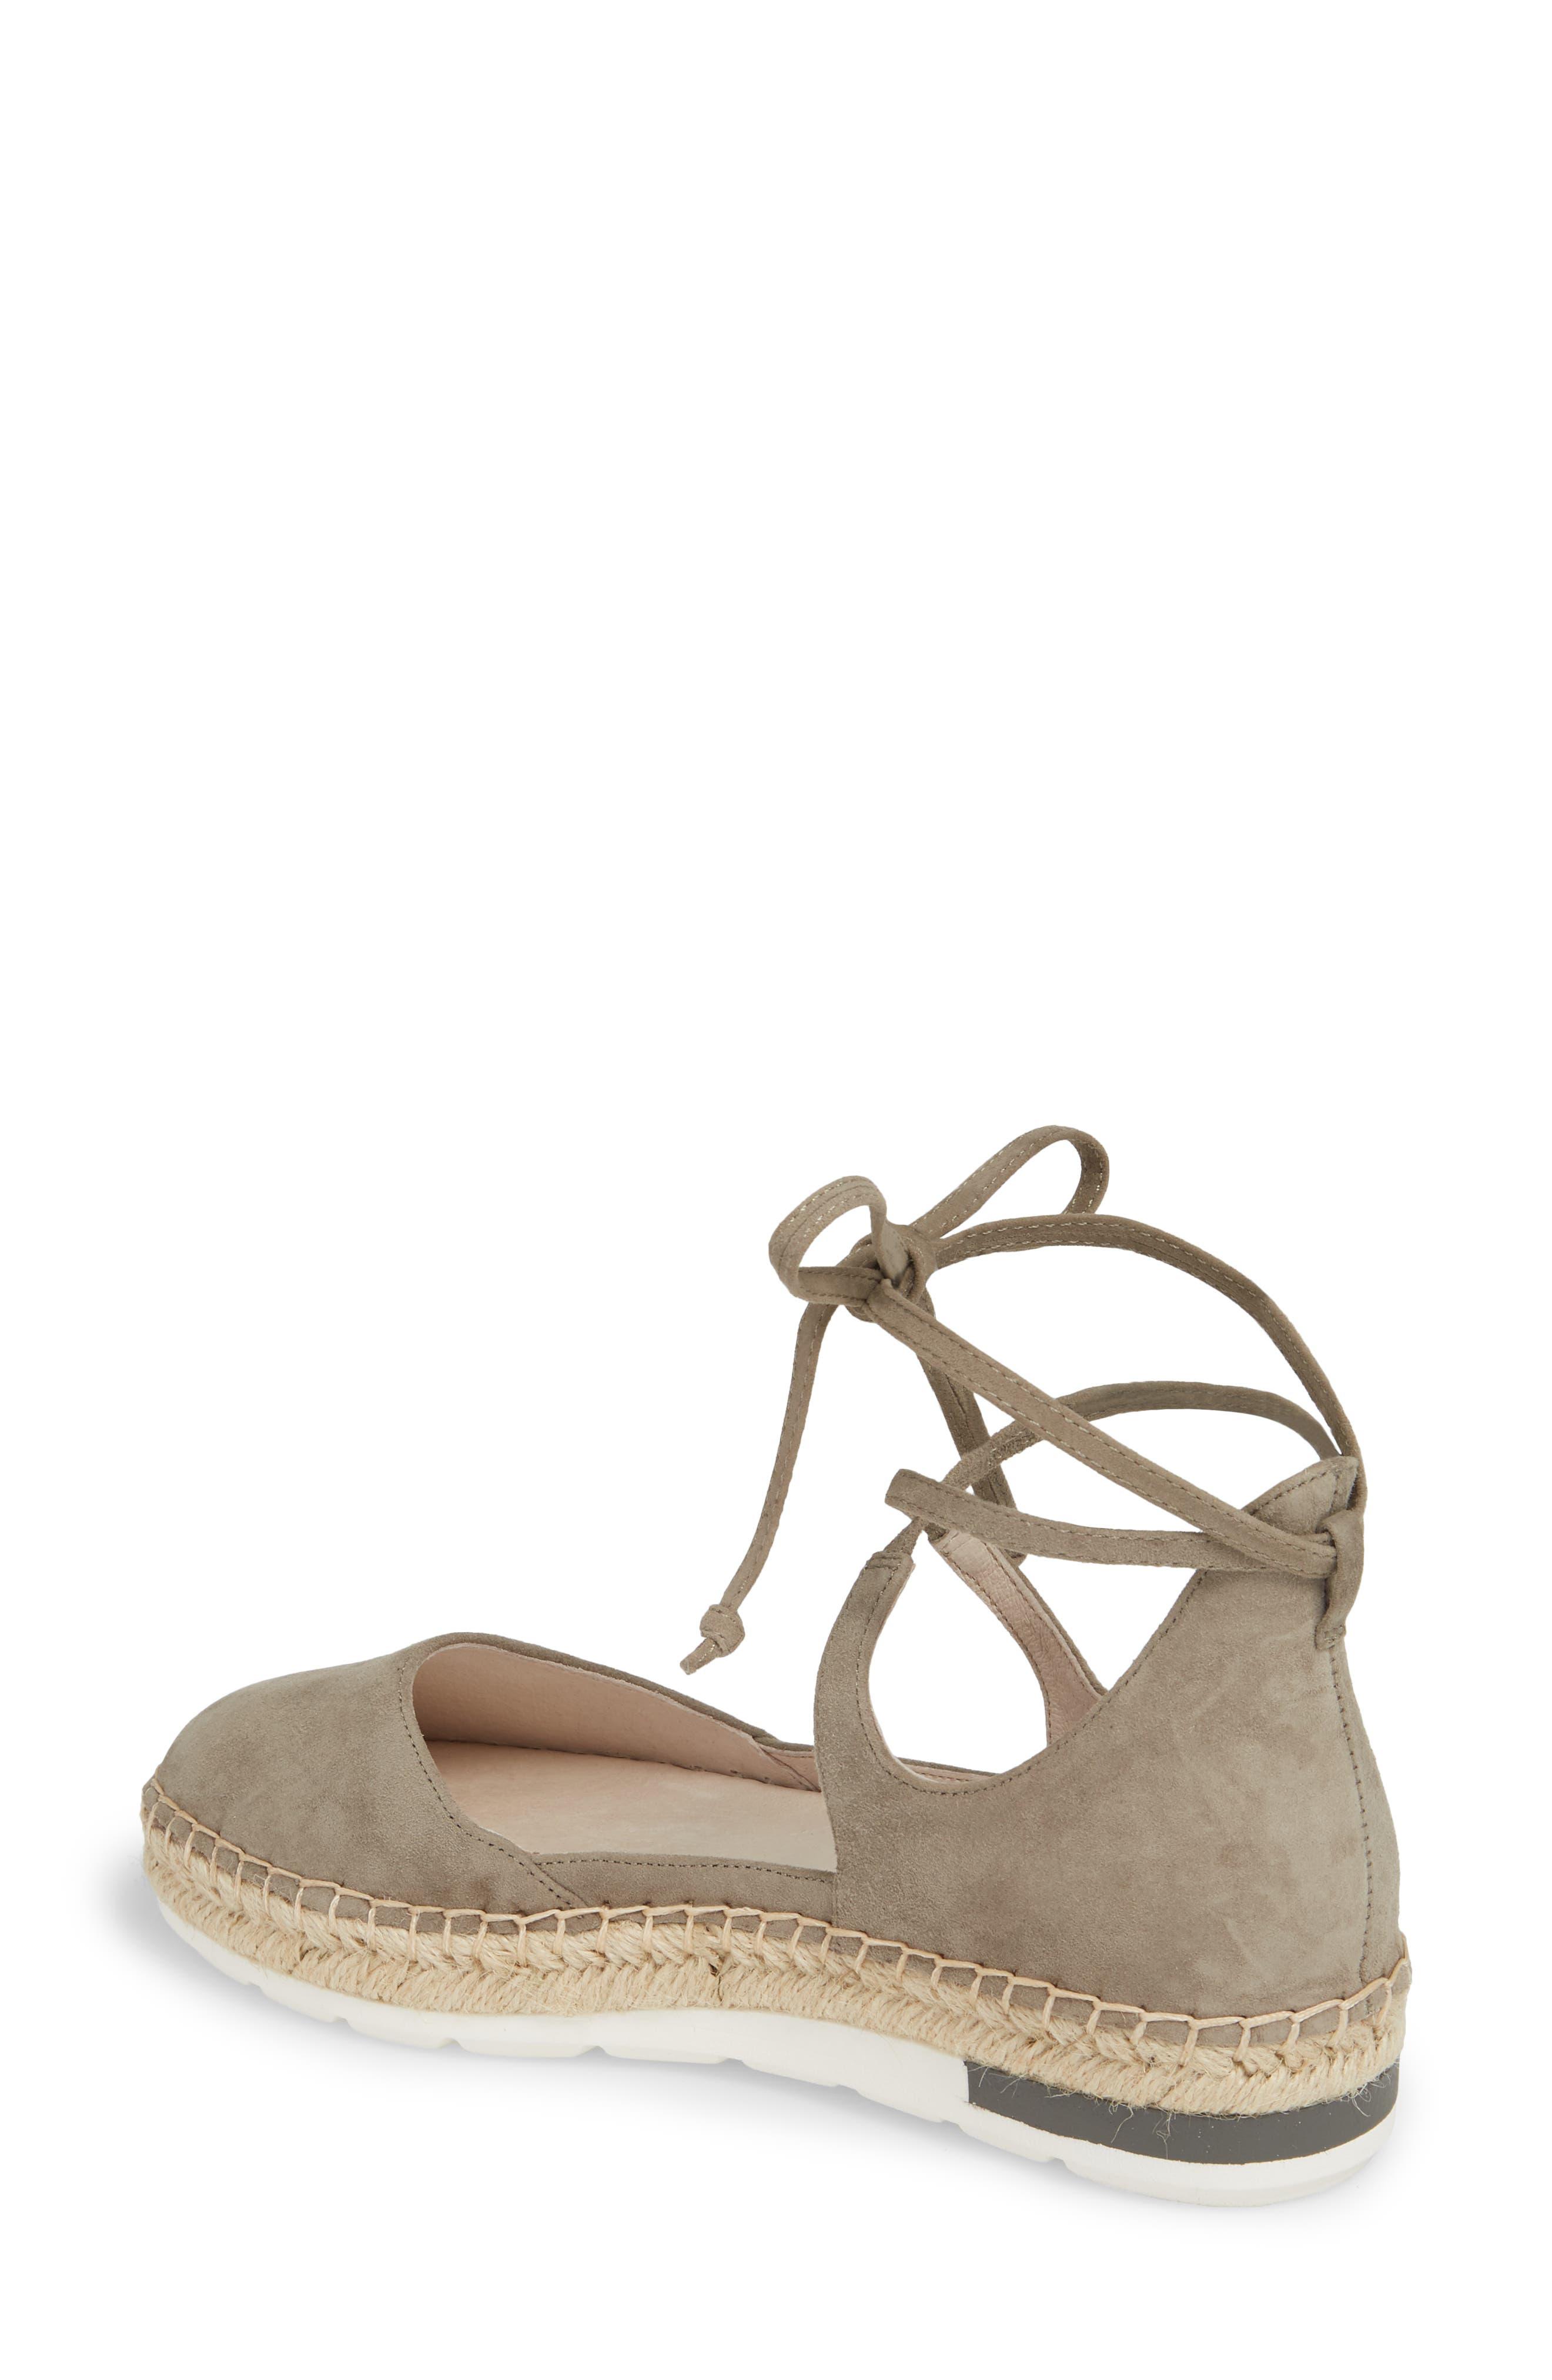 Leena Ankle Strap Sandal,                             Alternate thumbnail 2, color,                             Grey Suede